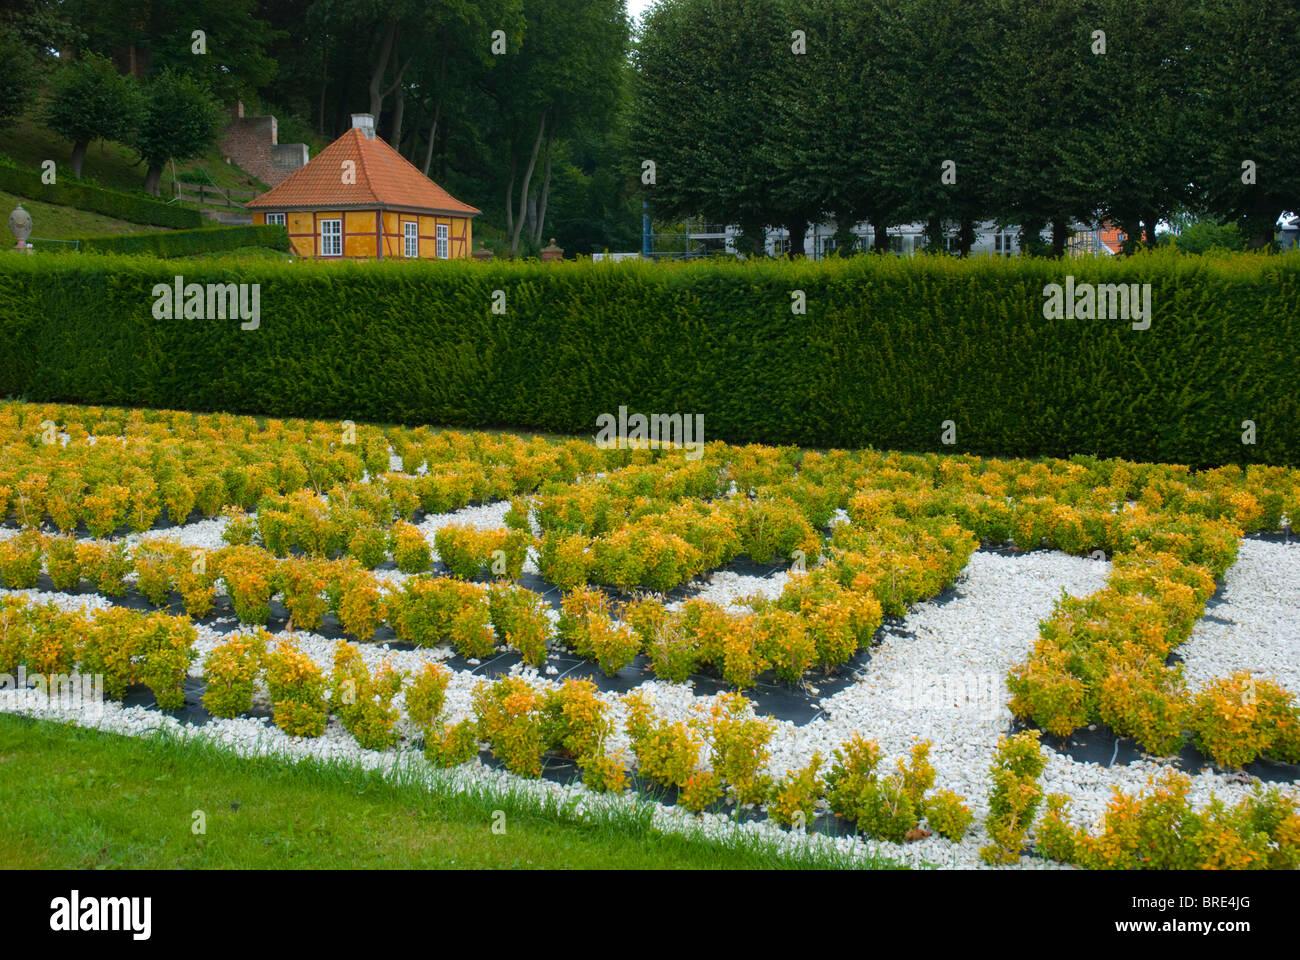 Marienlyst park central Helsingor north Sjaelland Denmark Europe - Stock Image